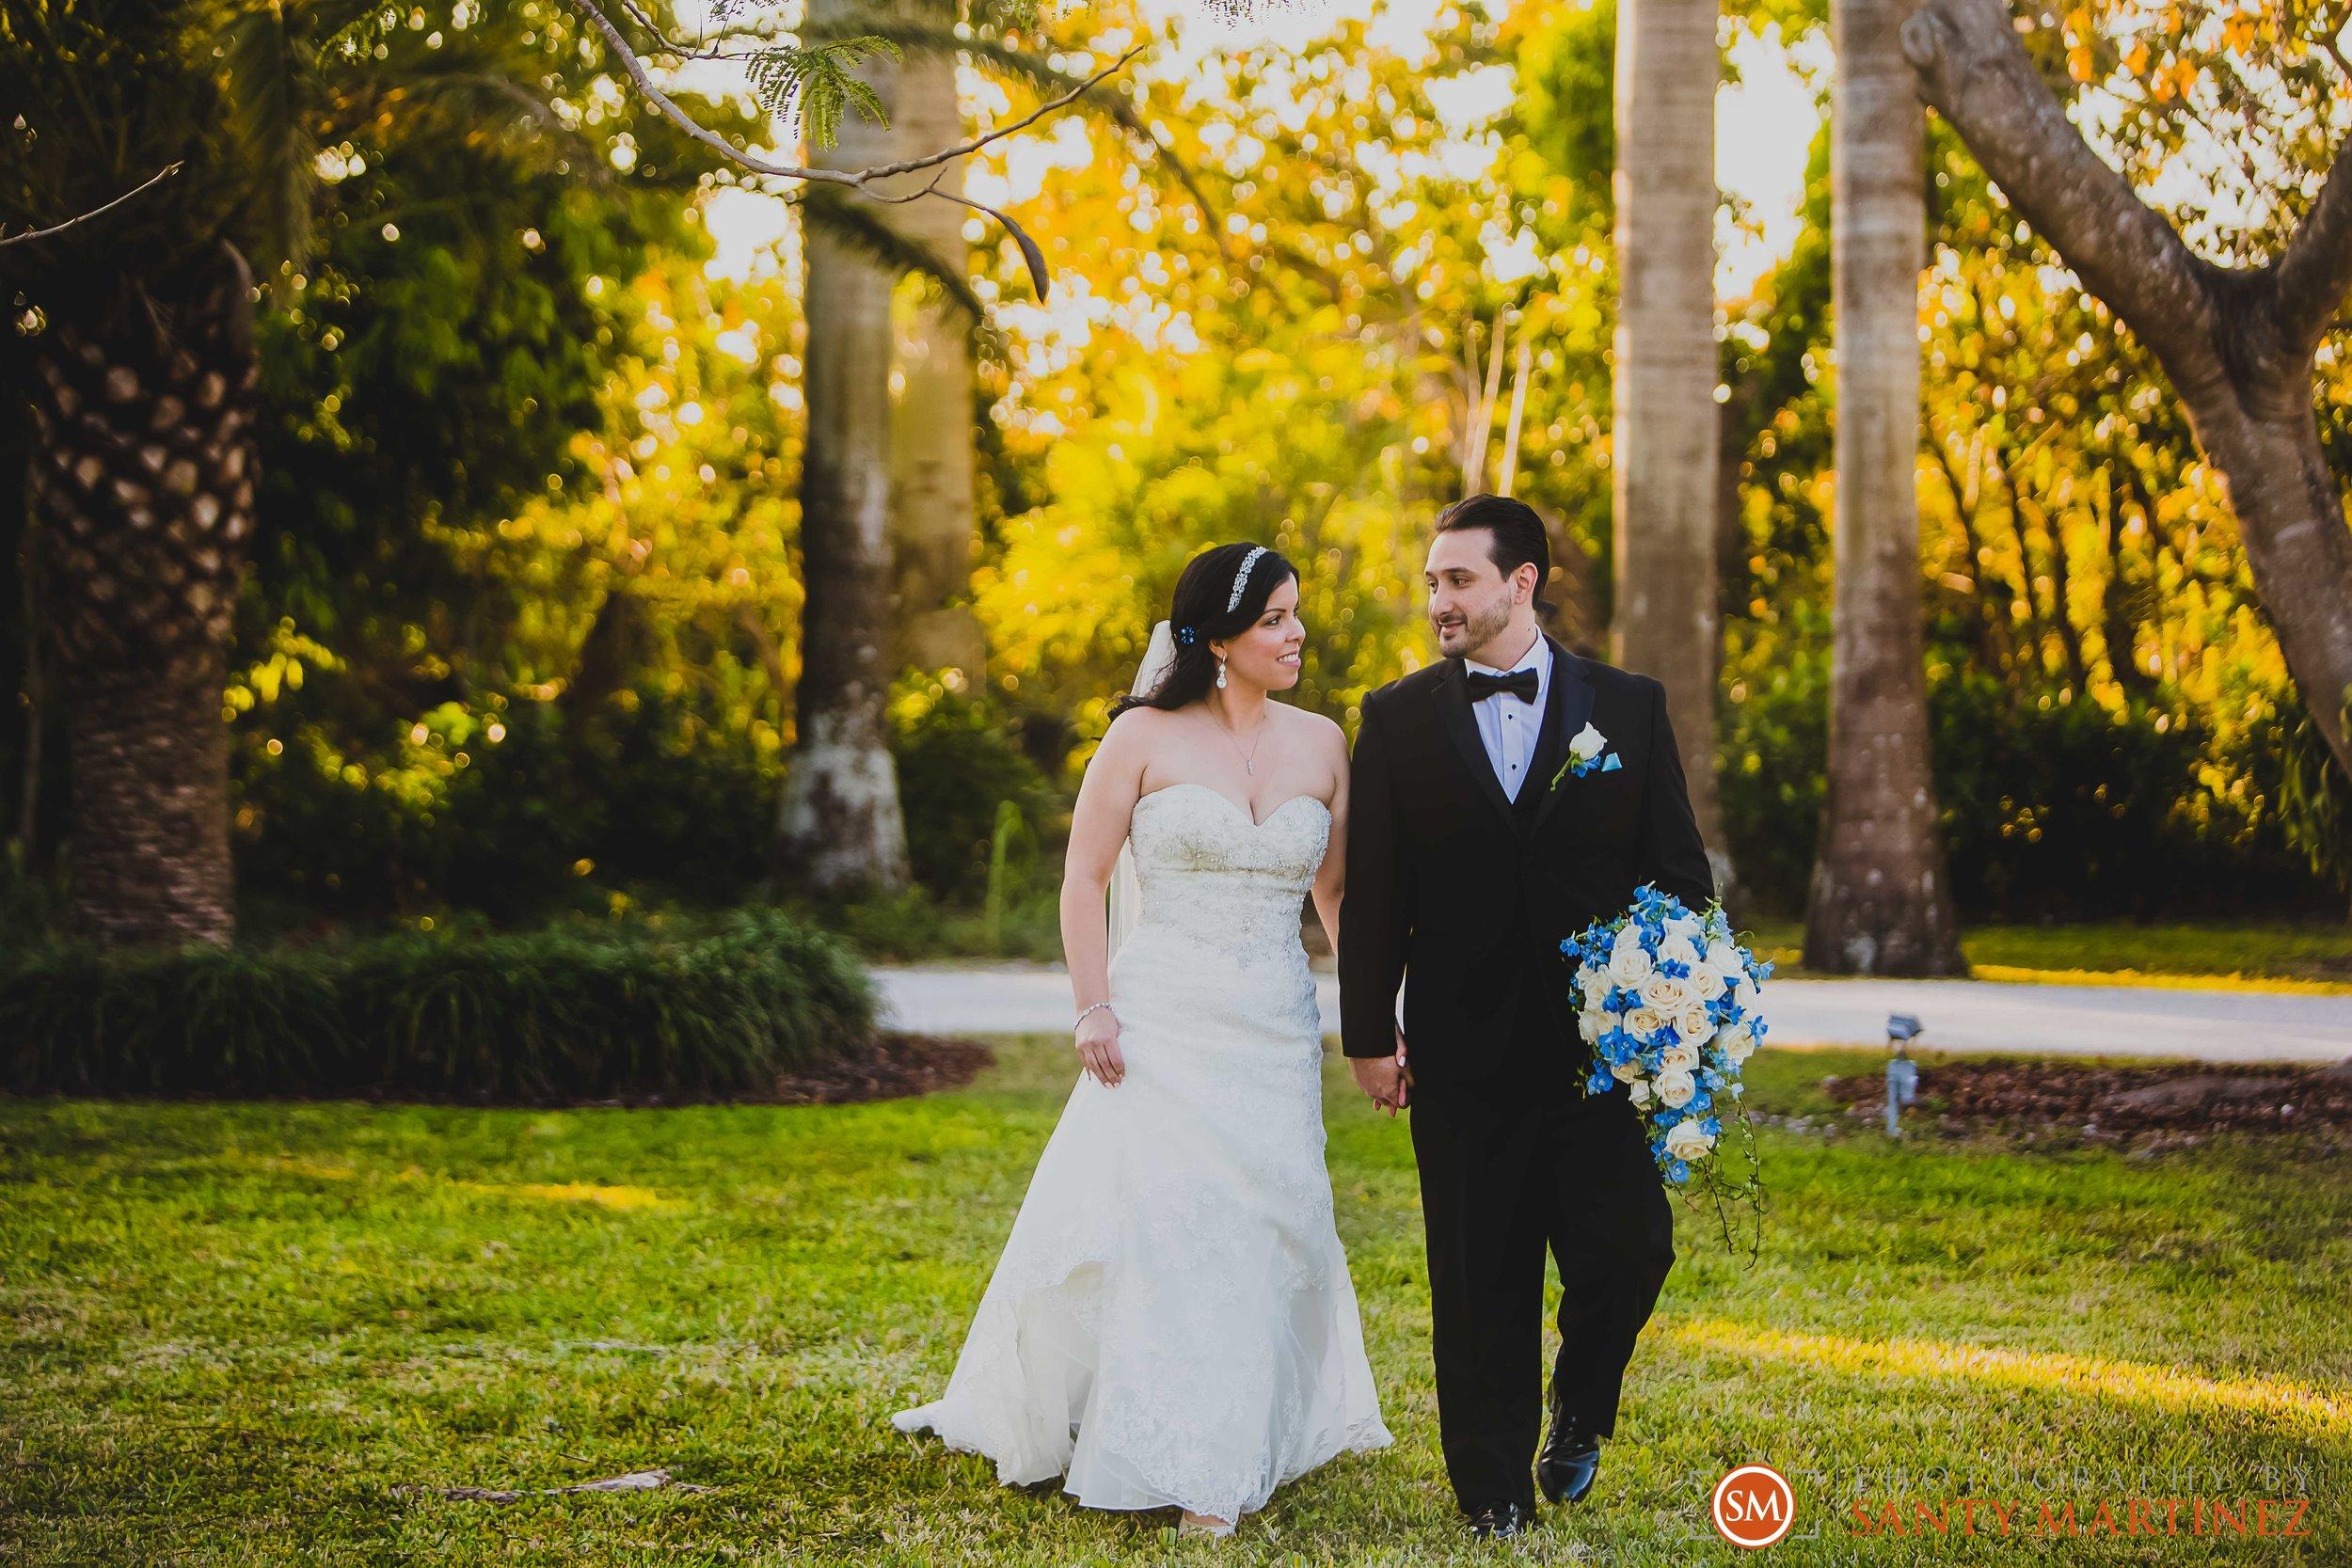 Wedding - Whimsical key West House - Photography by Santy Martinez-30.jpg